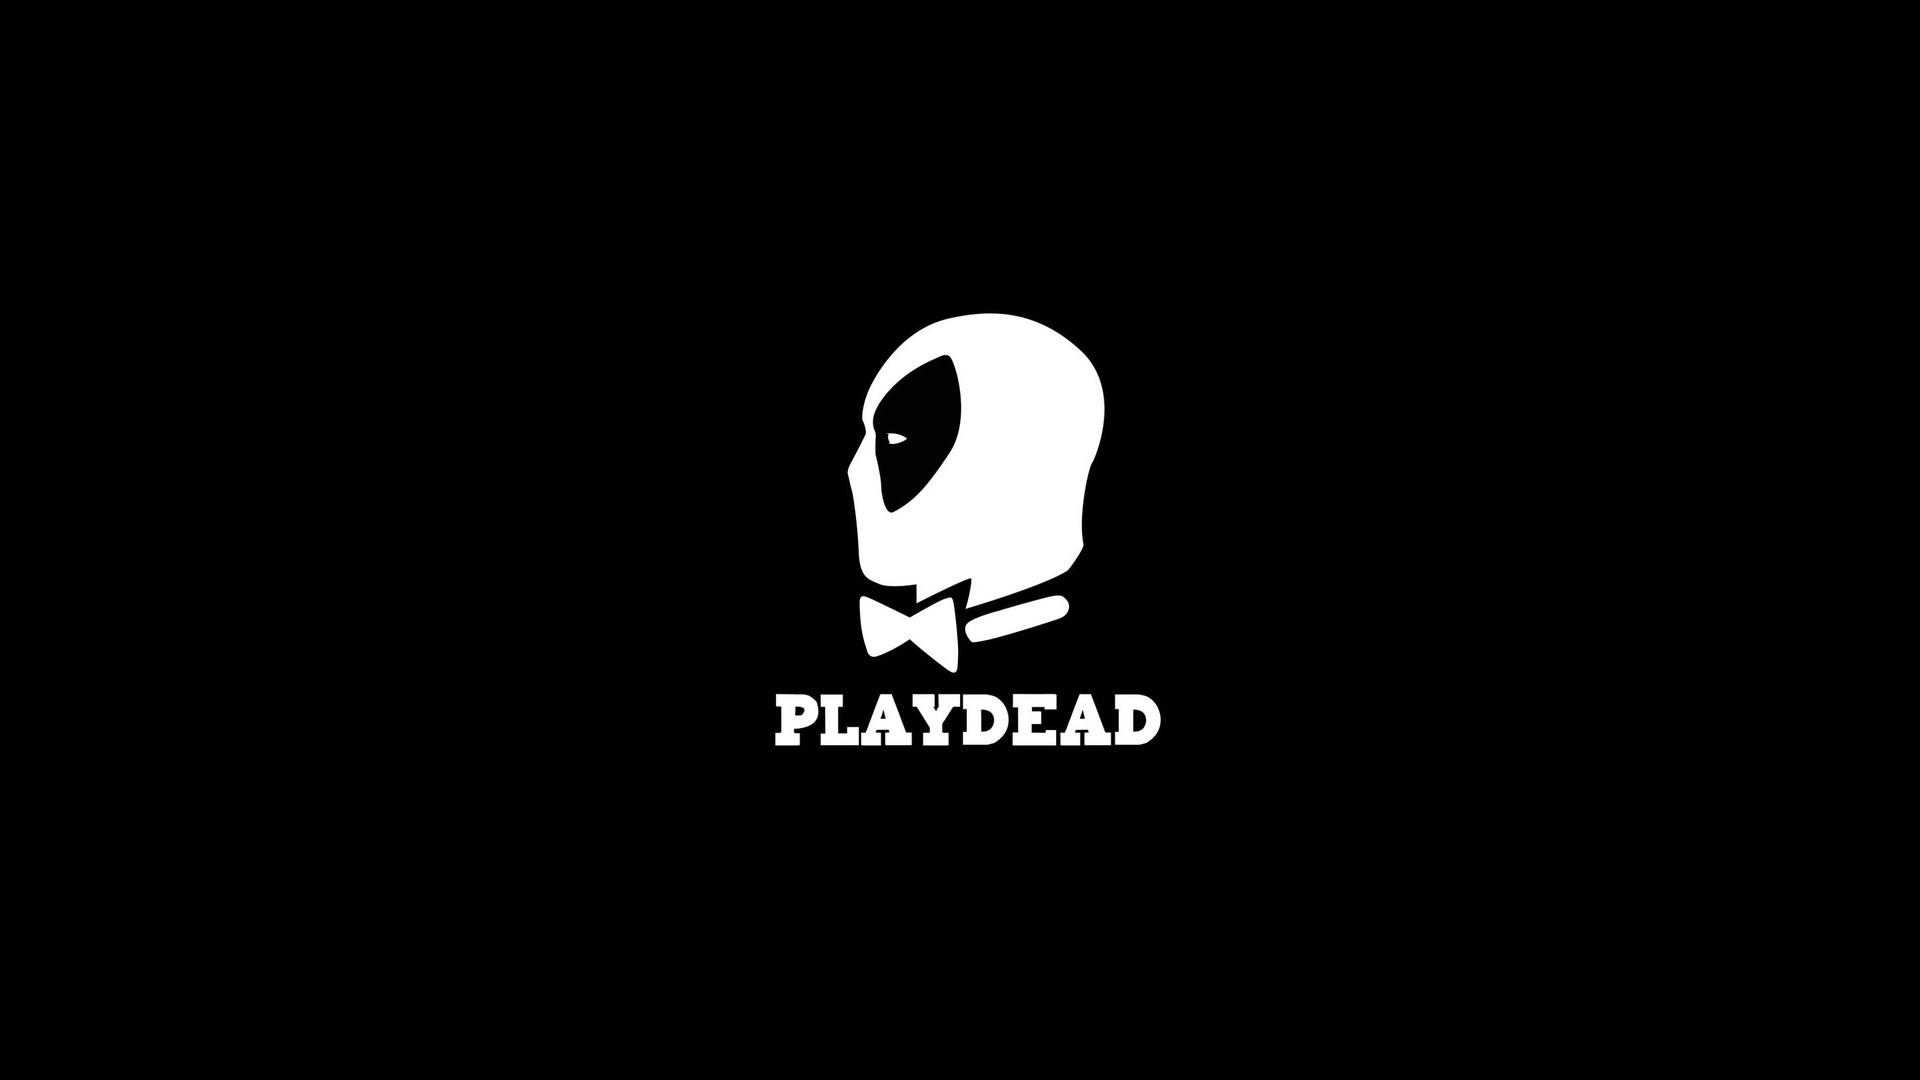 Best Wallpaper Logo Deadpool - monochrome-minimalism-movies-text-logo-Film-posters-Deadpool-brand-dead-pool-1920x1080-px-computer-wallpaper-font-567375  Pic_48983.jpg